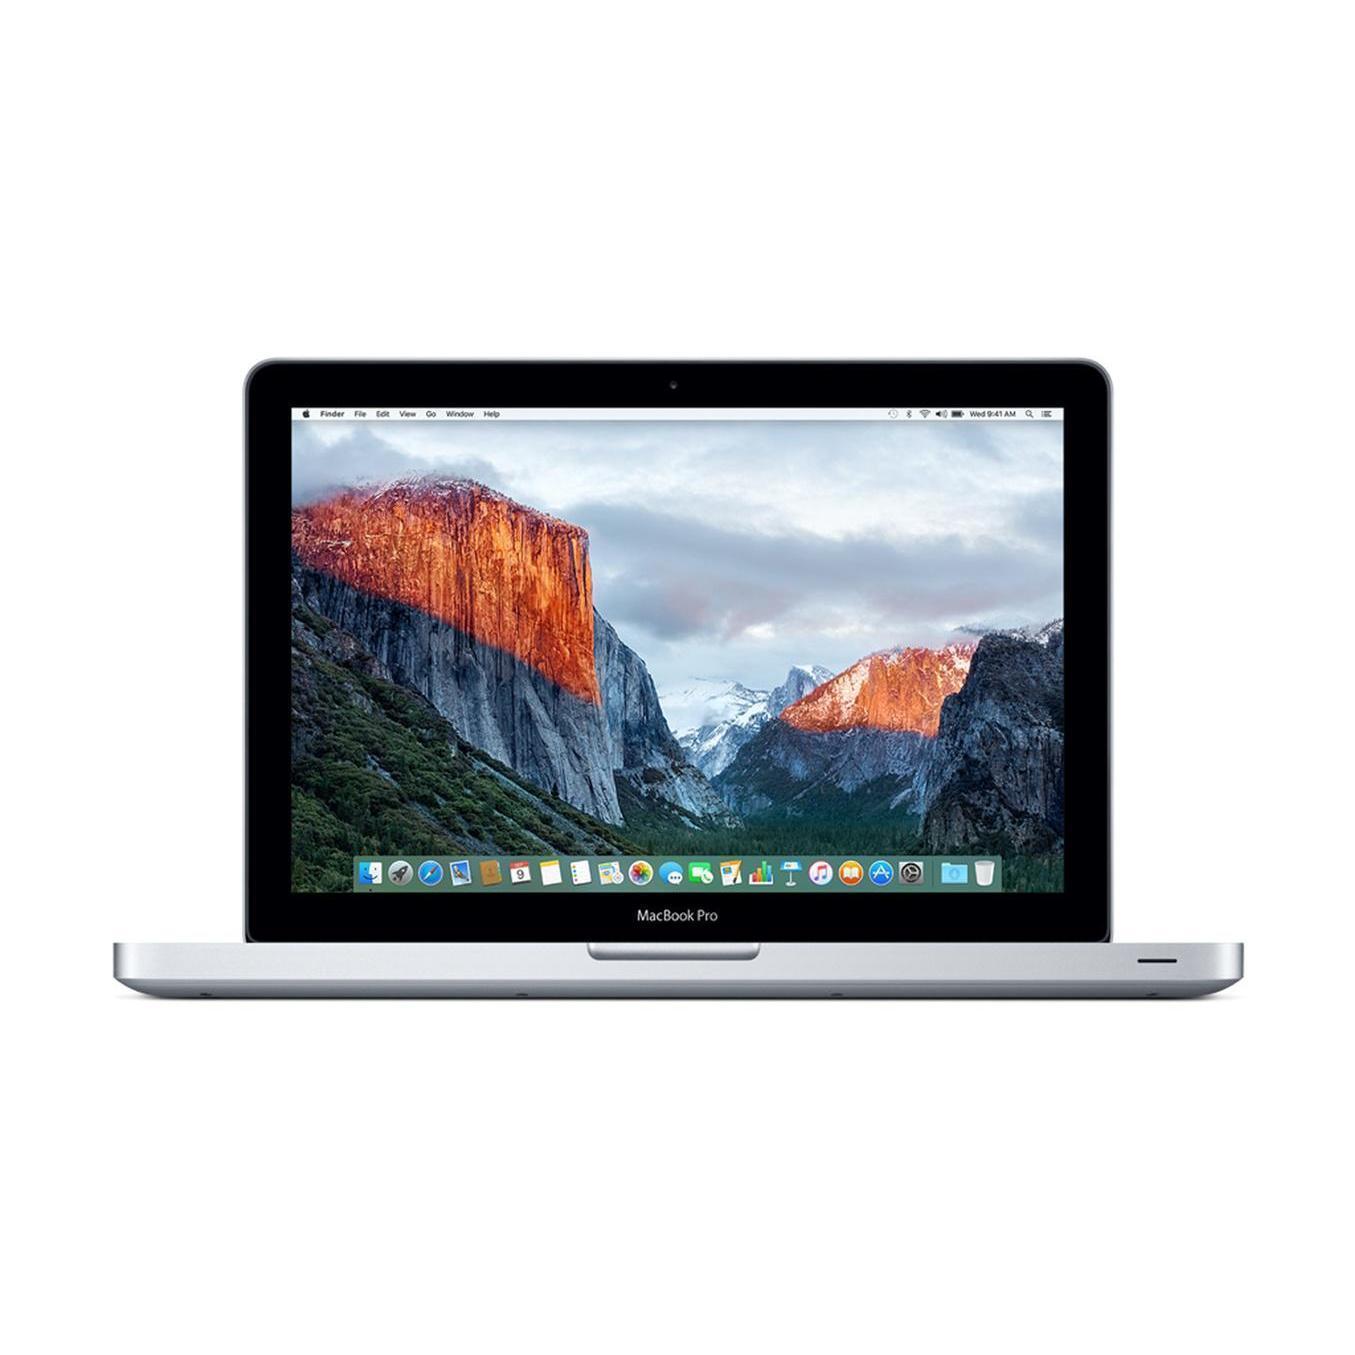 "MacBook Pro 13"" Core 2 Duo 2,26 GHz - HDD 160 Go - RAM 2 Go"